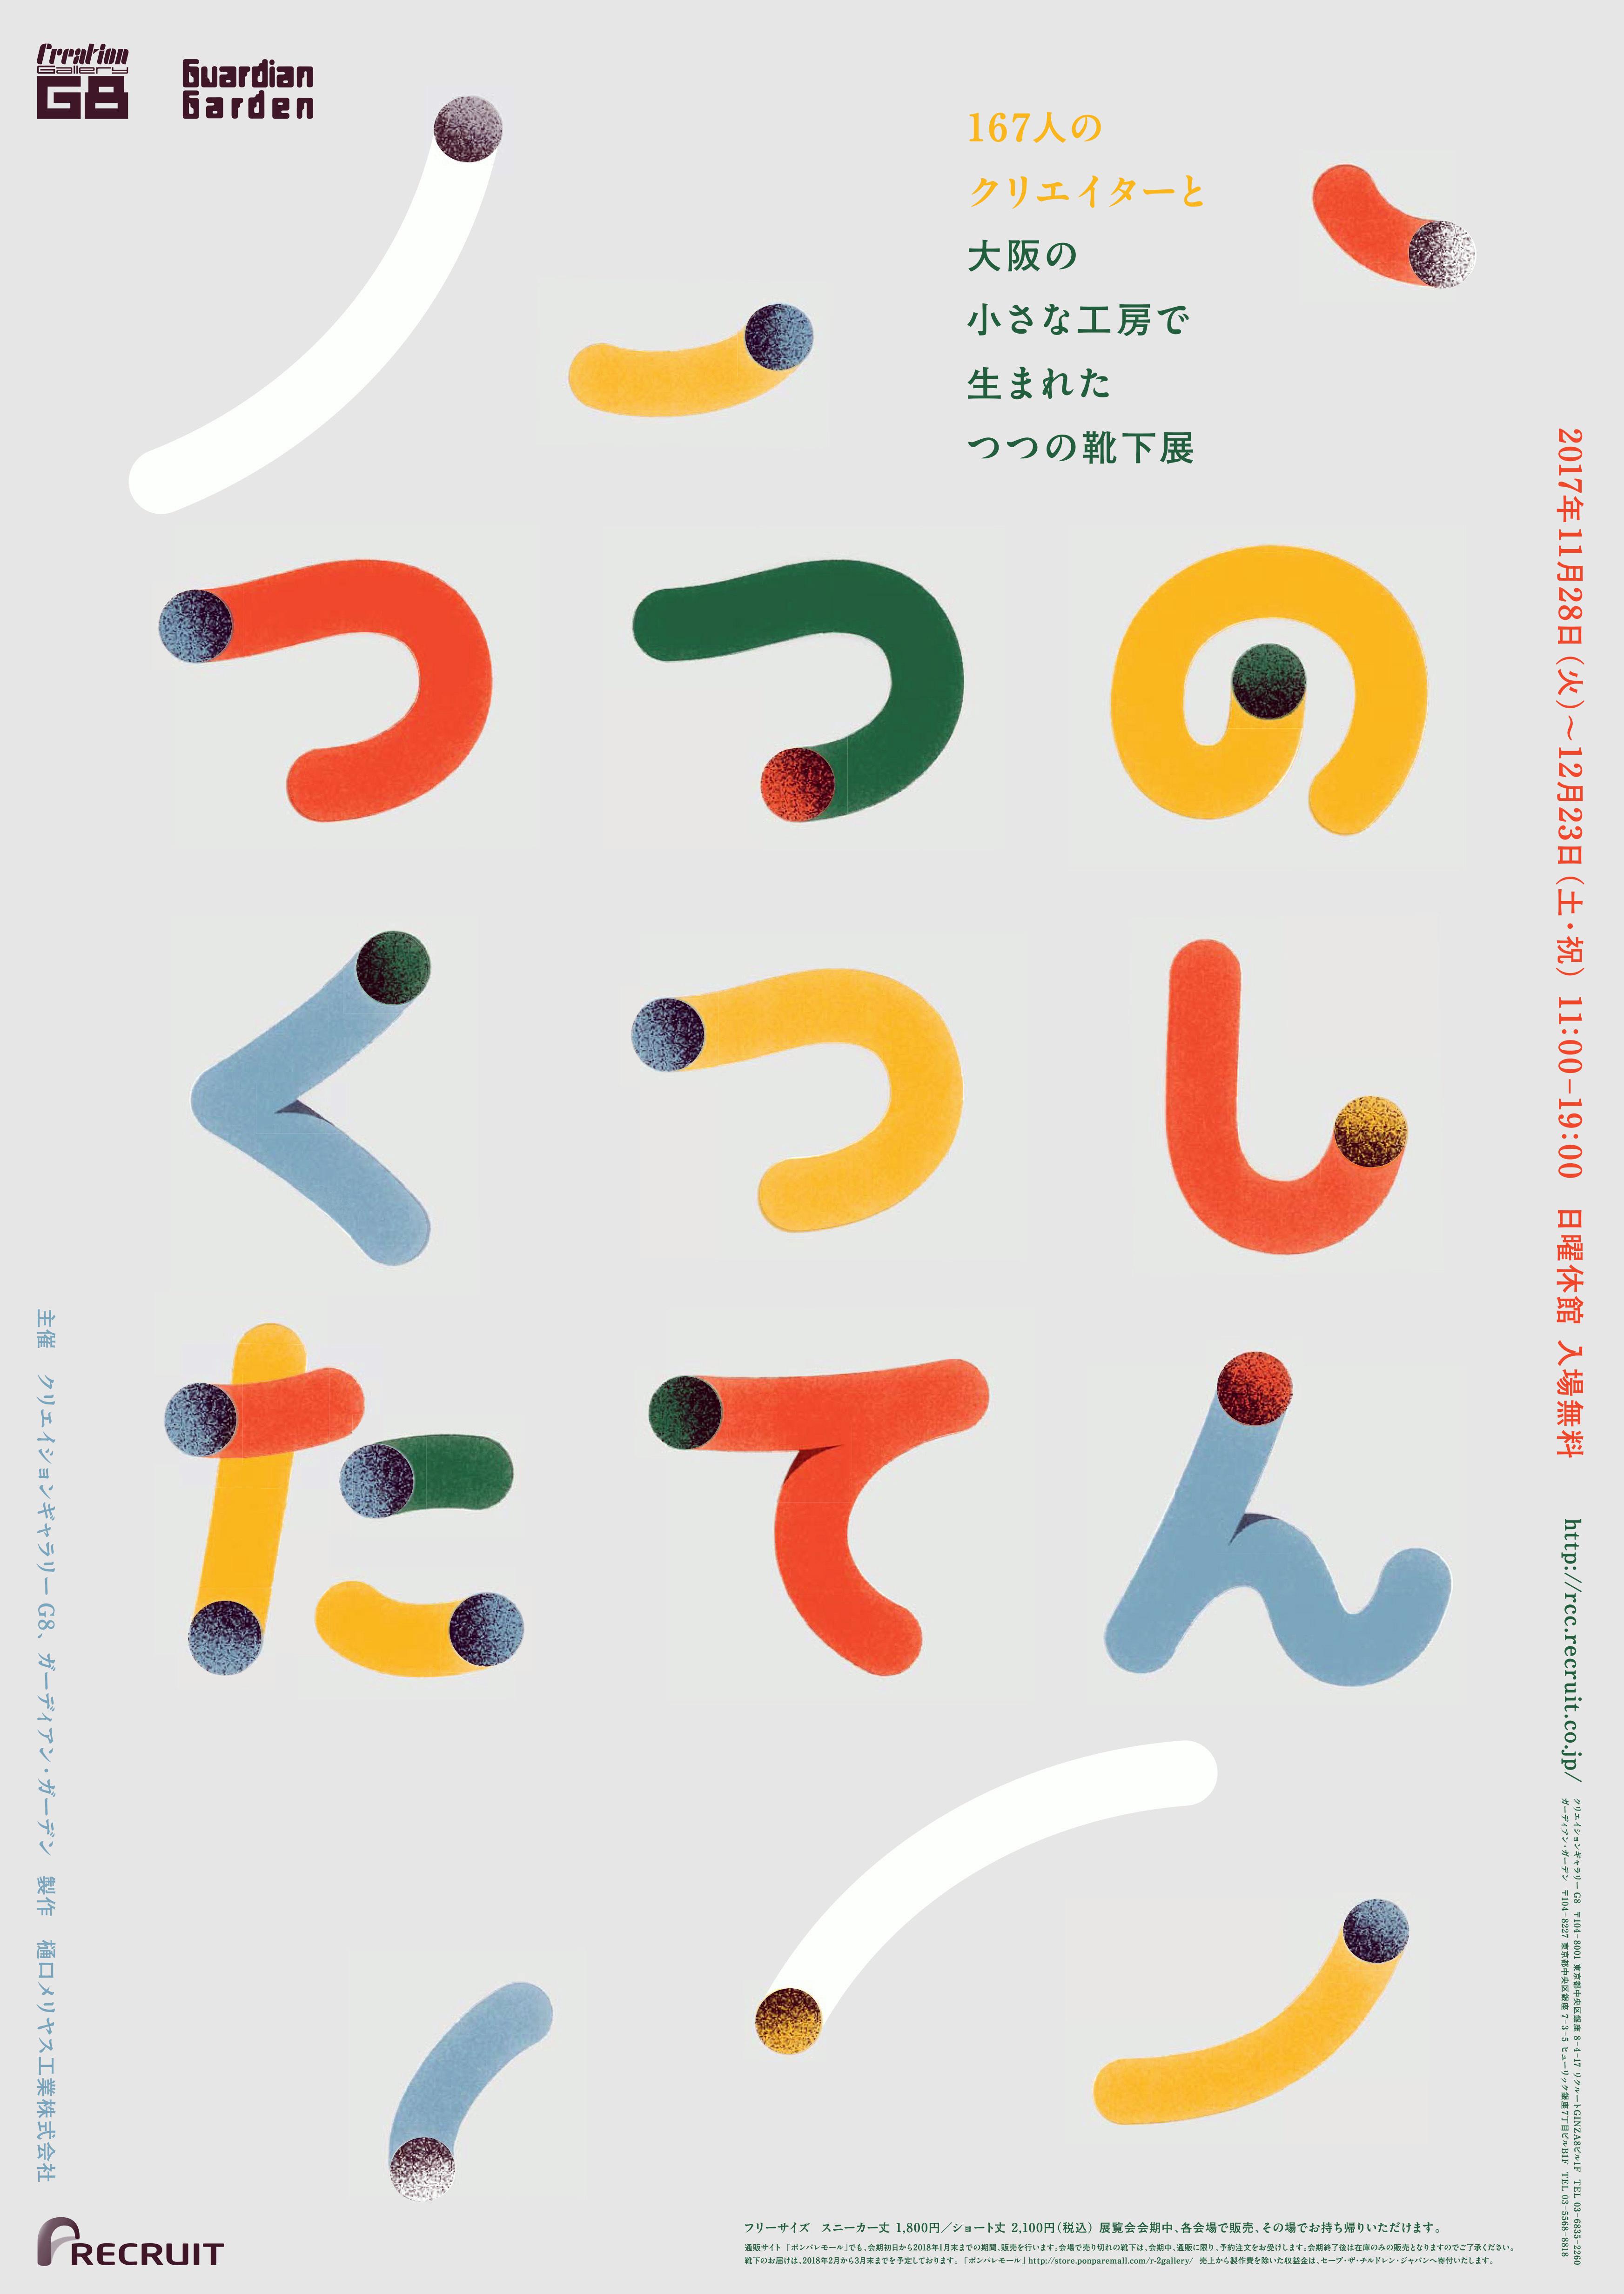 poster design: shogo kishino